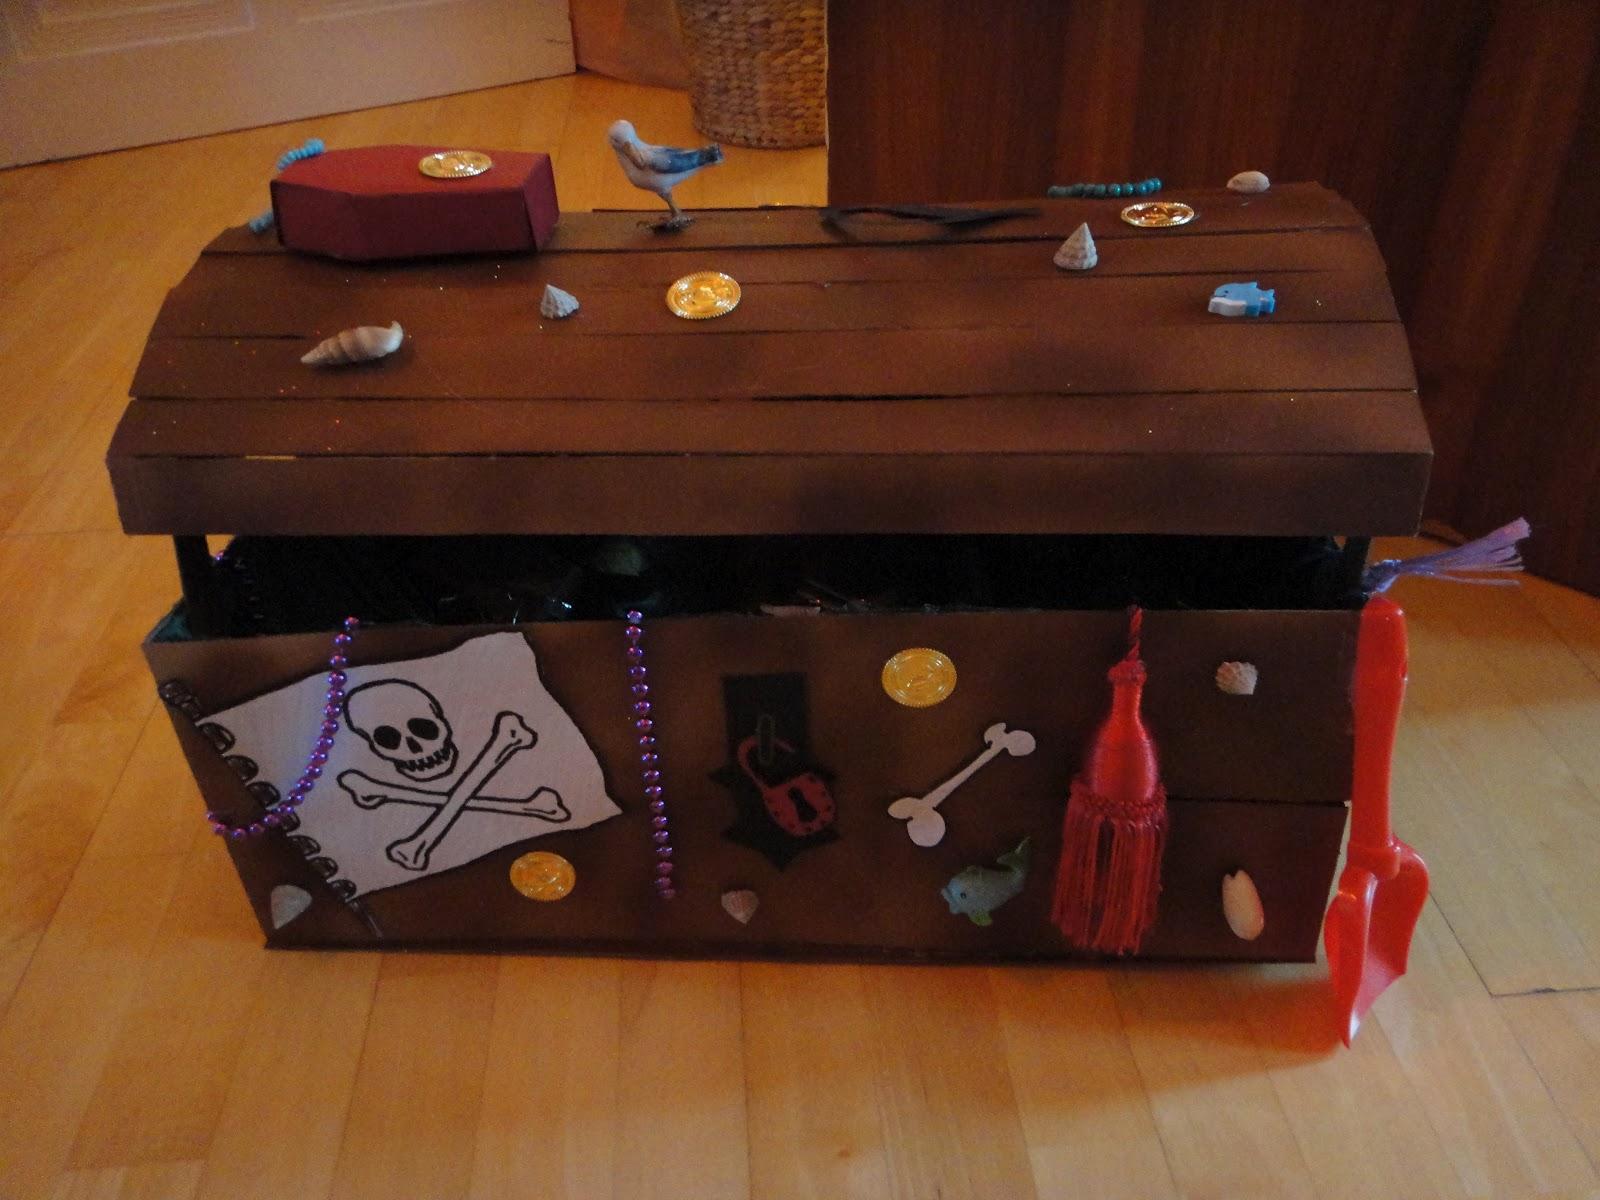 basteln stempeln stanzen schatztruhe oder schatzkiste. Black Bedroom Furniture Sets. Home Design Ideas